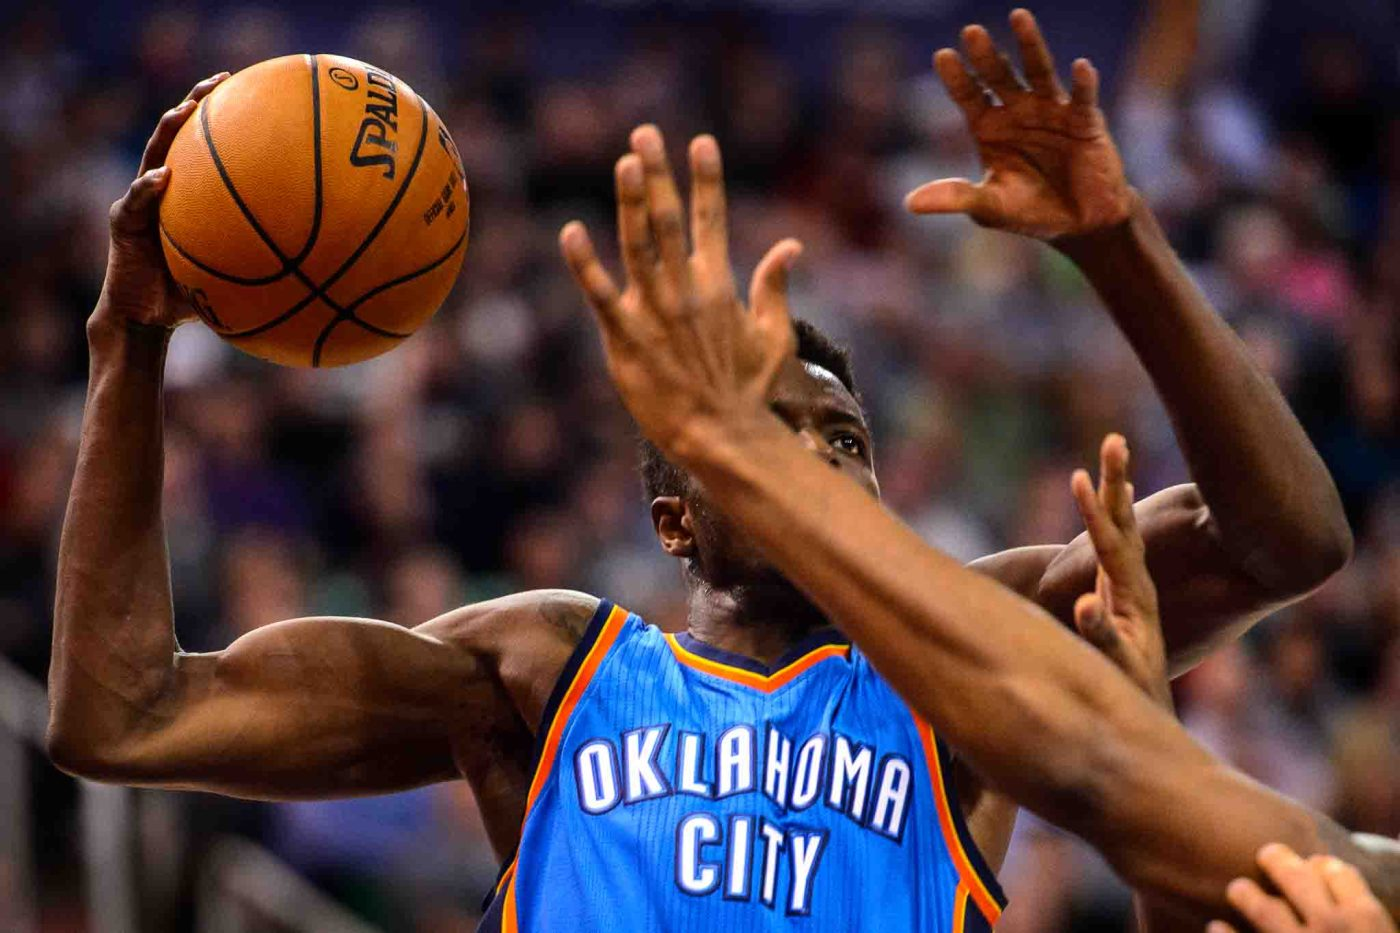 Oklahoma City Thunder forward Jerami Grant (9) goes up for a shot as the Utah Jazz host the Oklahoma City Thunder, NBA basketball in Salt Lake CityWednesday December 14, 2016